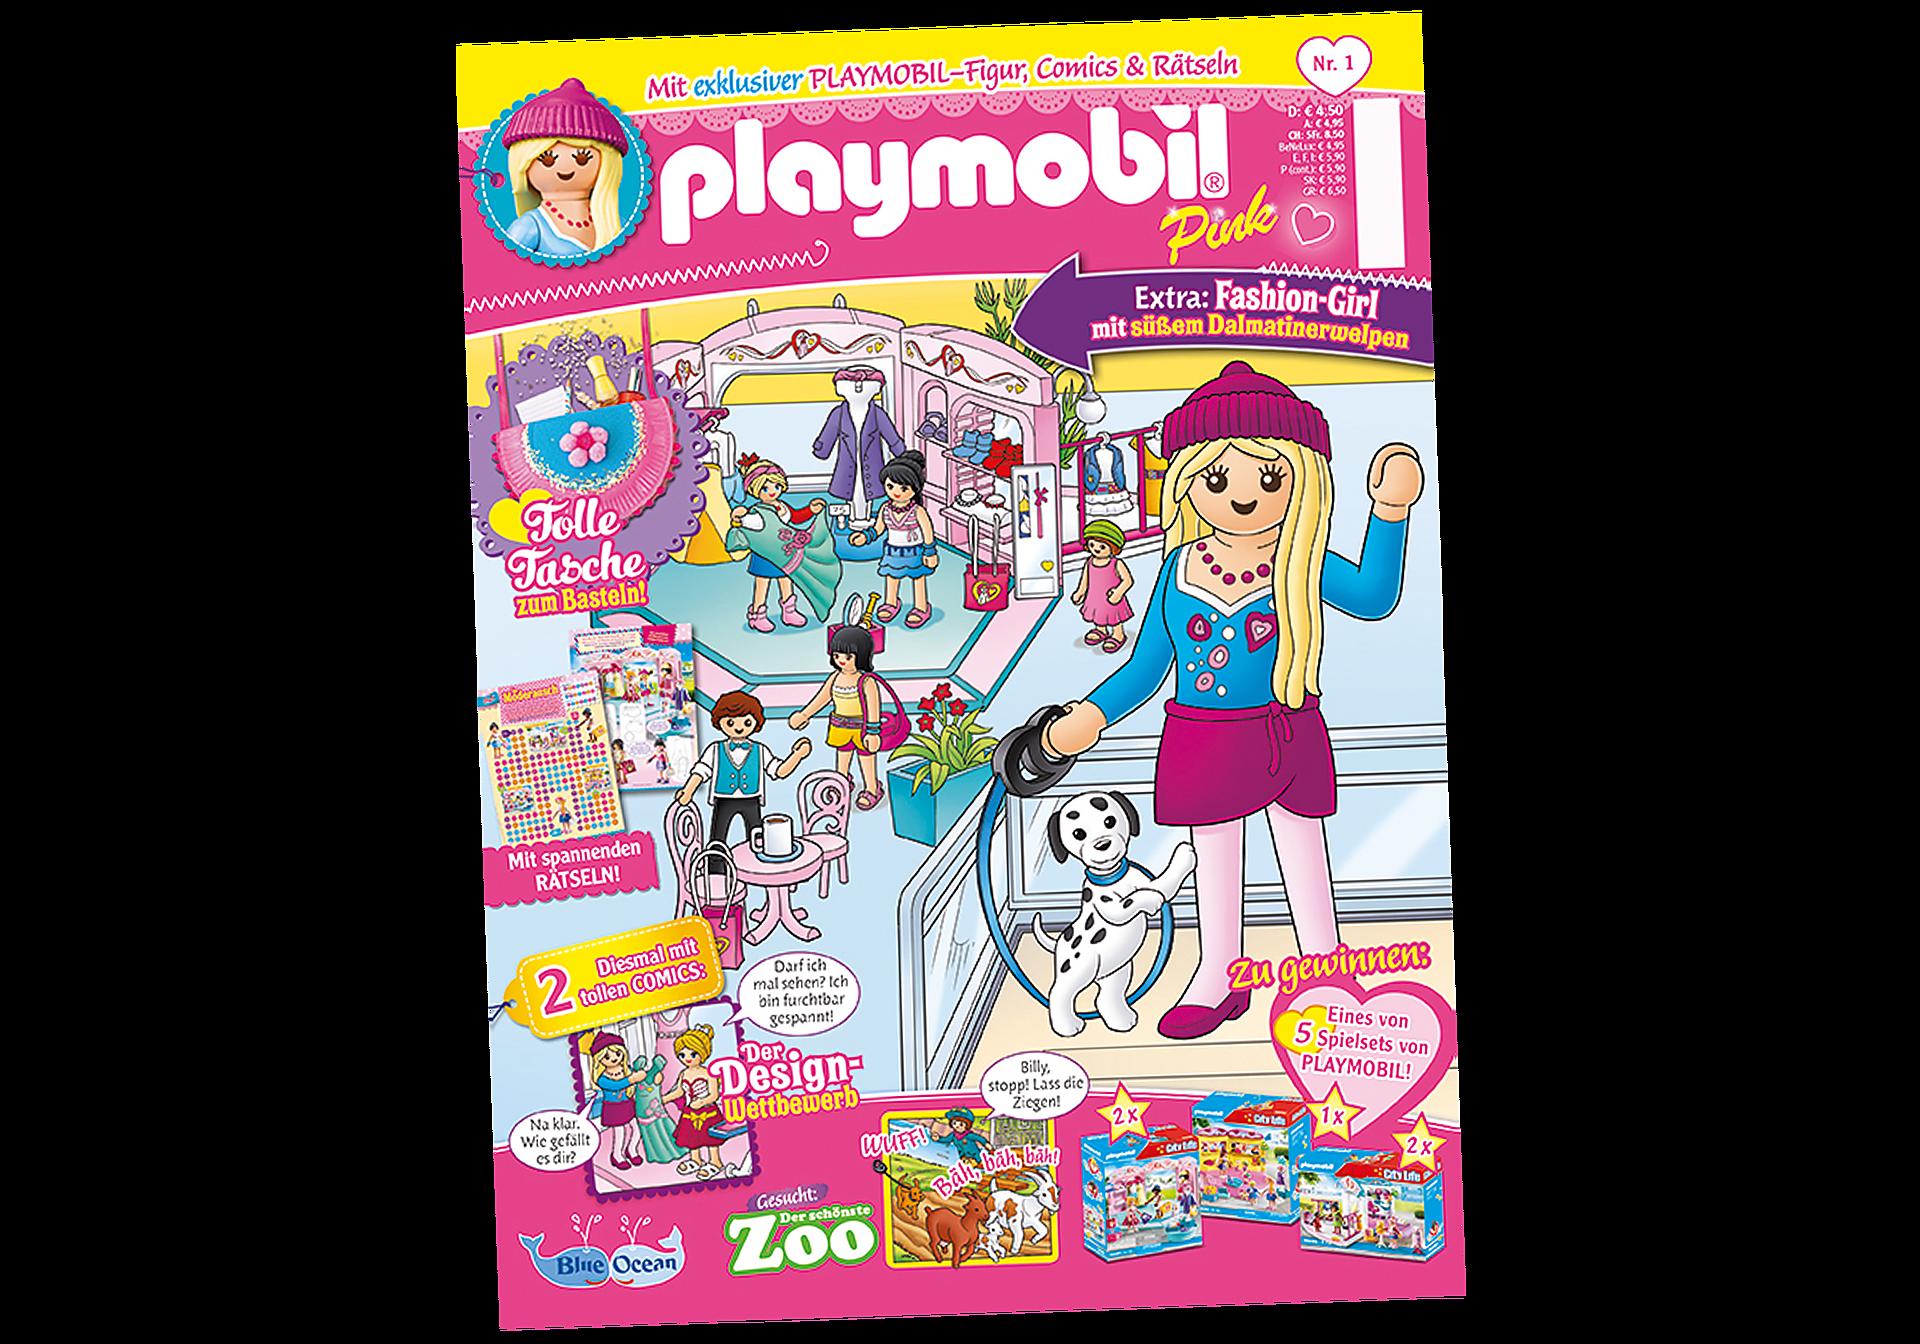 80674 PLAYMOBIL-Magazin Pink 1/2021 (Heft 59) zoom image1